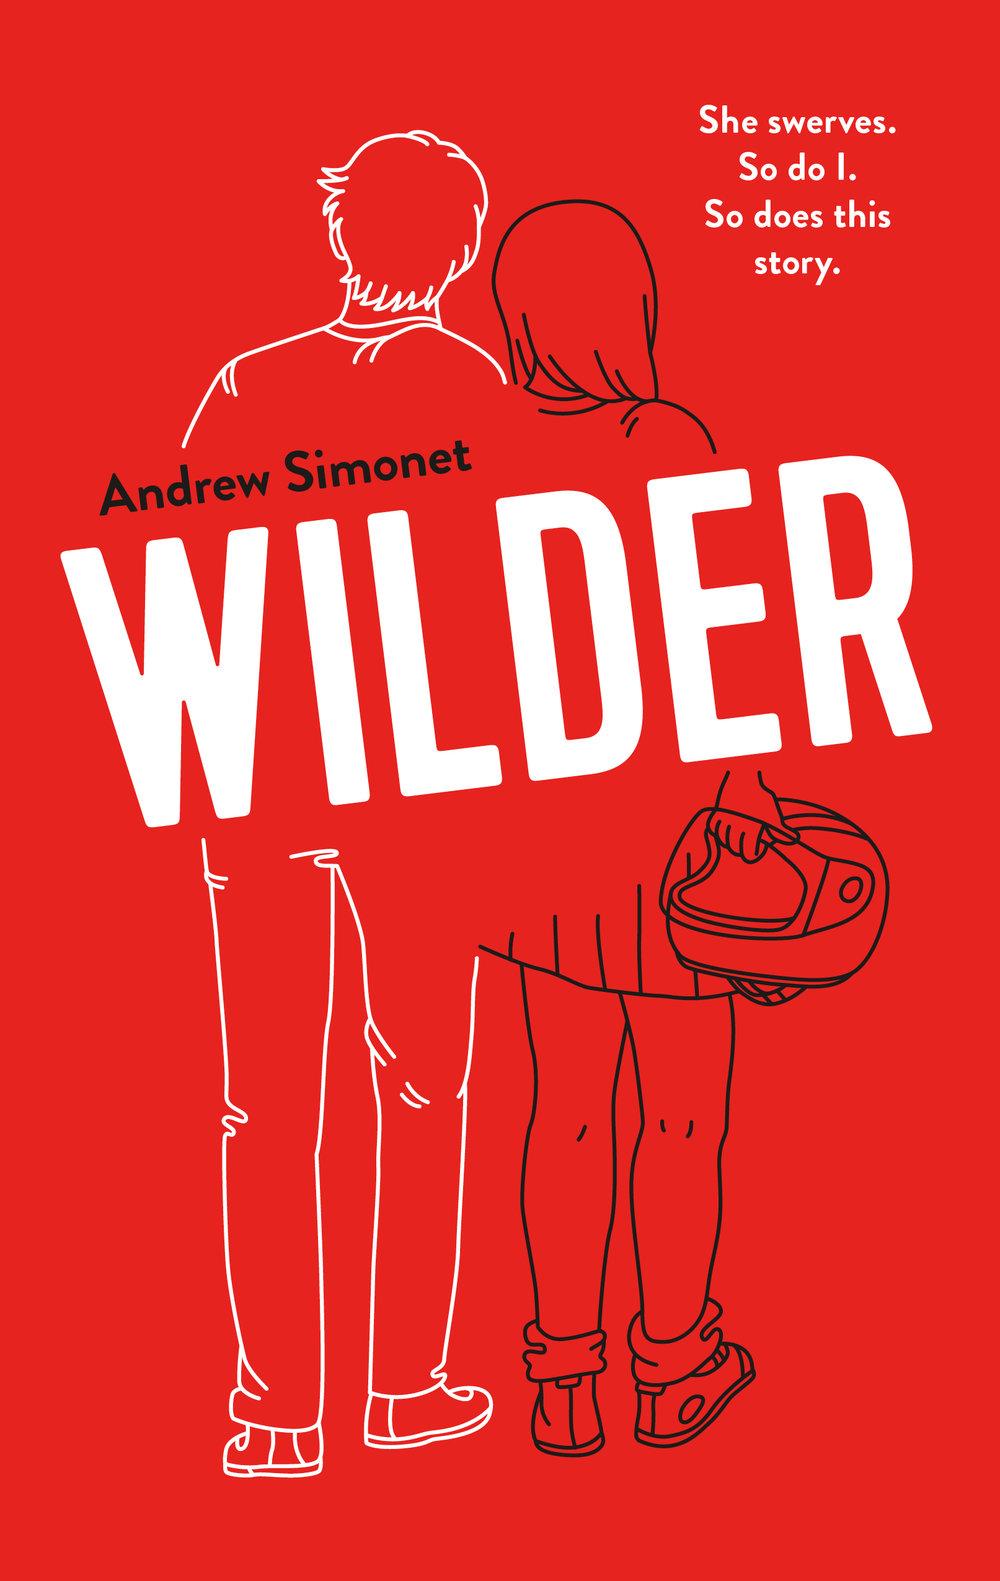 WILDER FINAL COVER 12.21.17.jpg